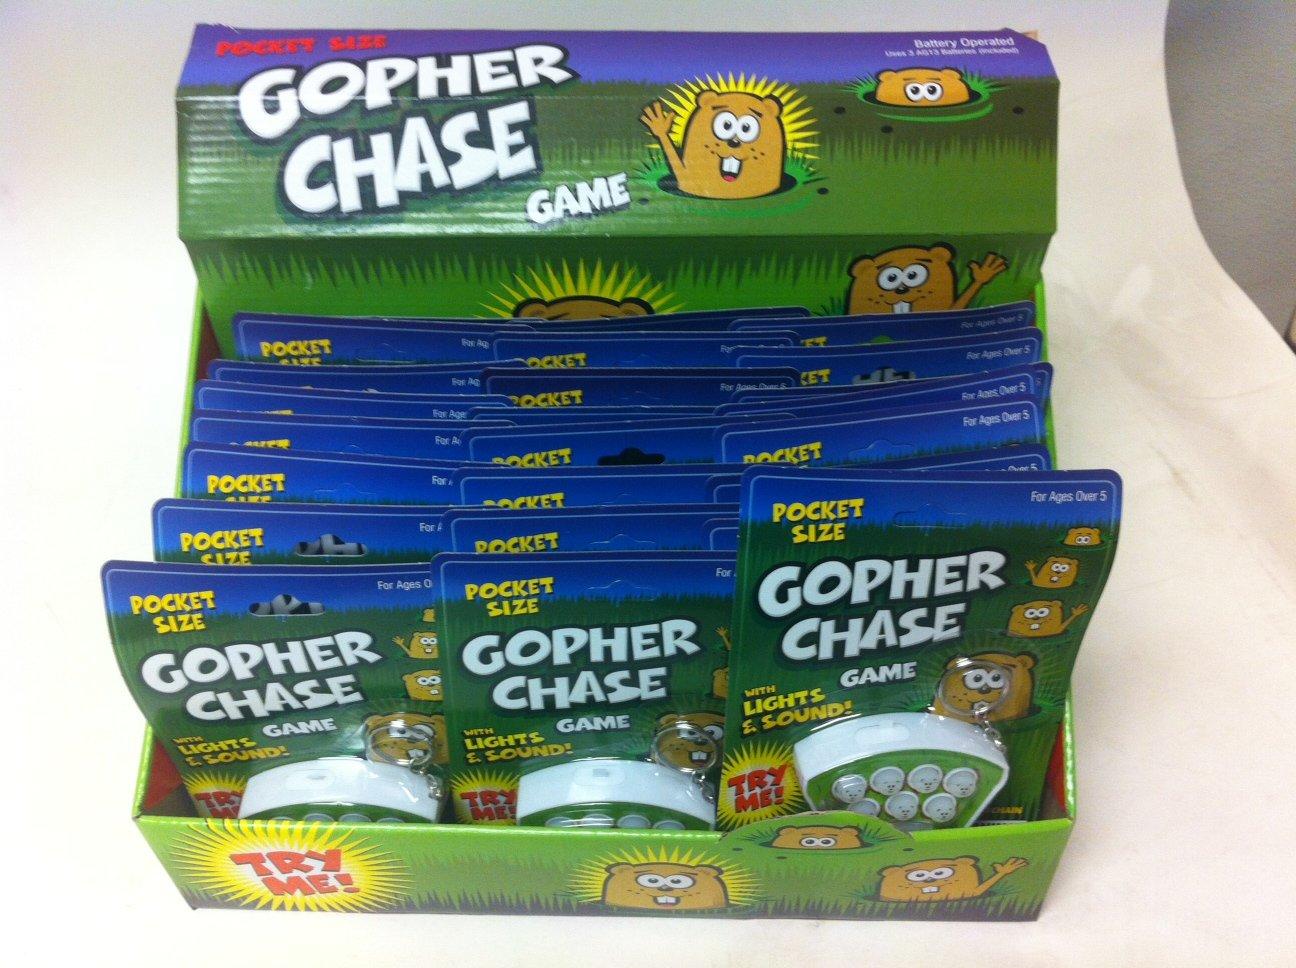 【お買得!】 [Playmaker Toys]Playmaker Toys Playmaker Pocket Size Gopher Chase Game w/ Lights & Sound Keychain Game 585 [並行輸入品] B004Q6VWAQ, 和洋 中華食器の産地問屋本荘 64d43d38